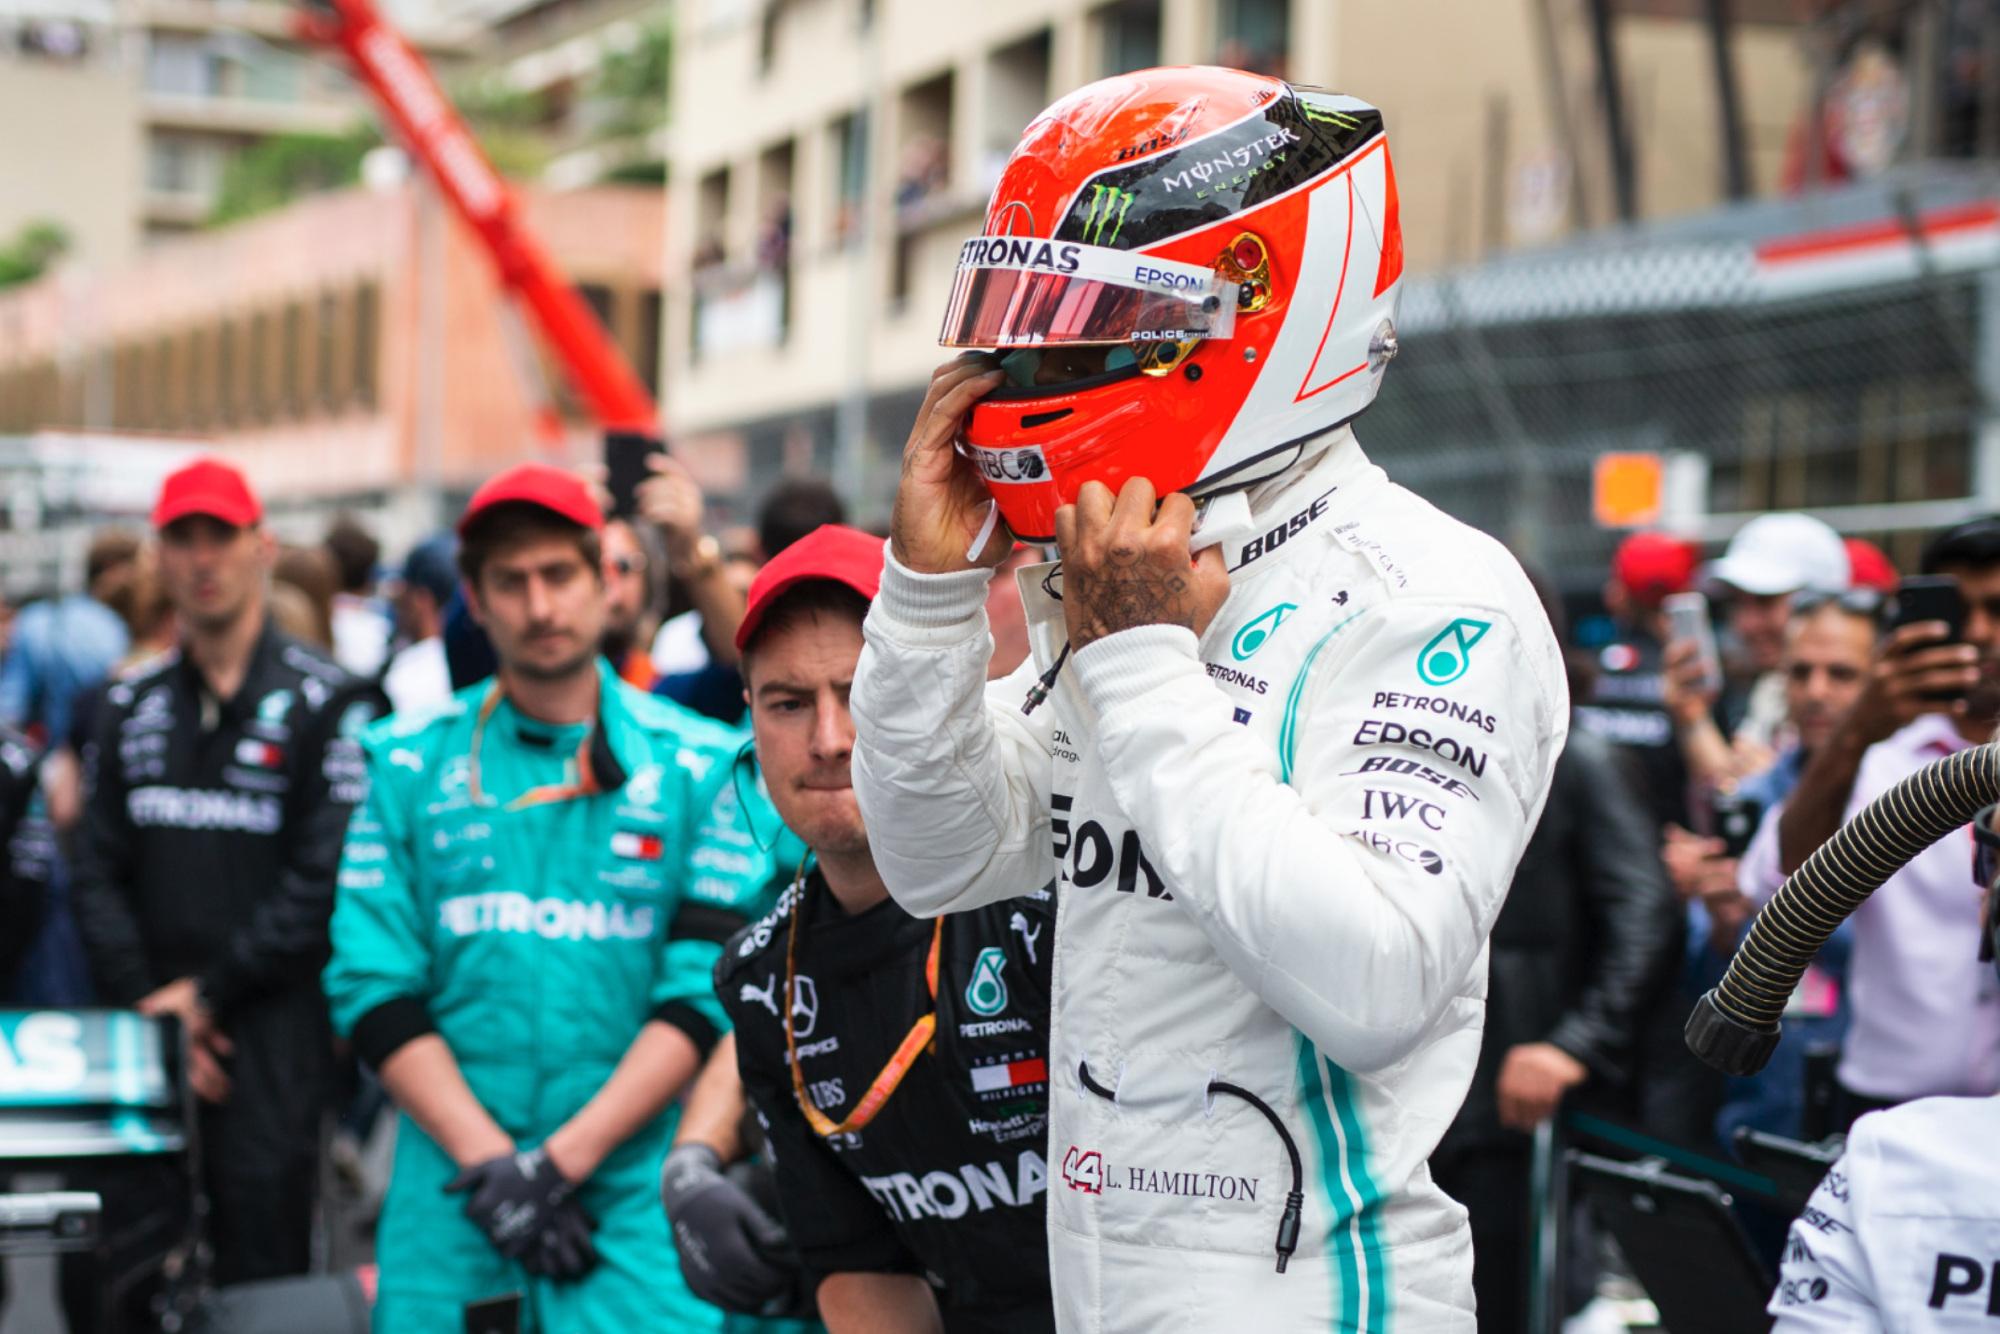 Lewis Hamilton at the 2019 Monaco Grand Prix